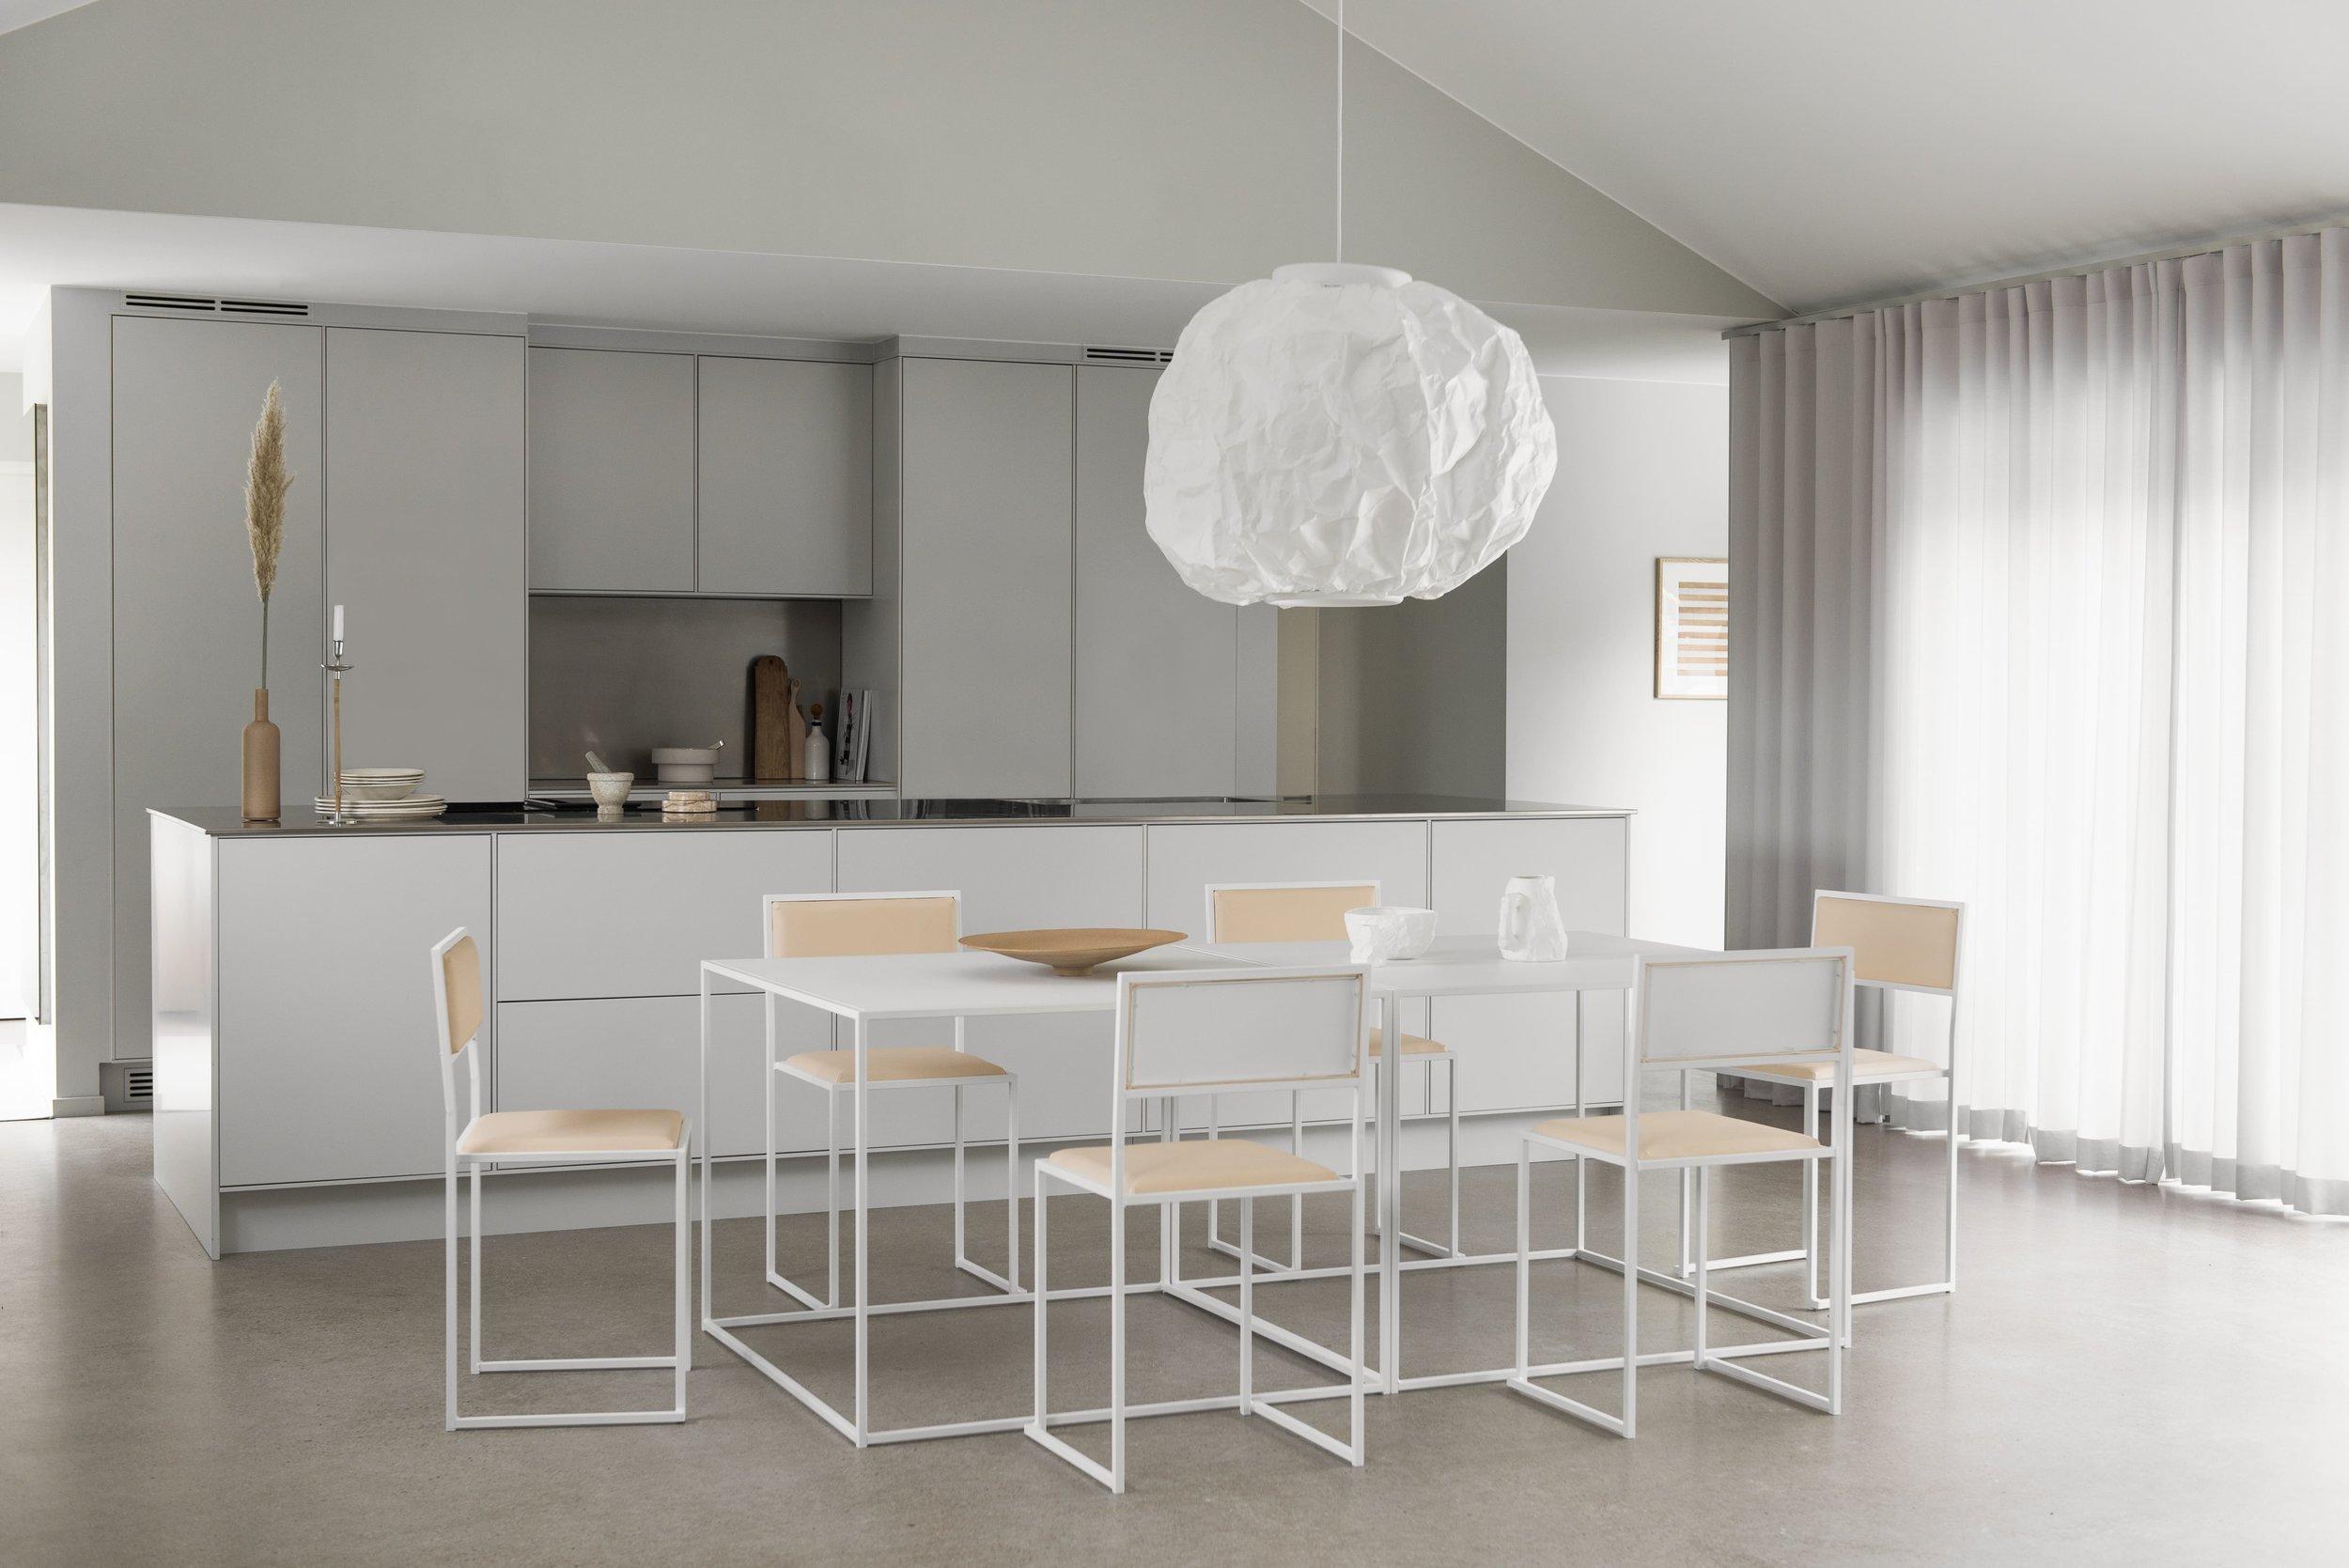 Swedish Ultra Minimalism Design Of